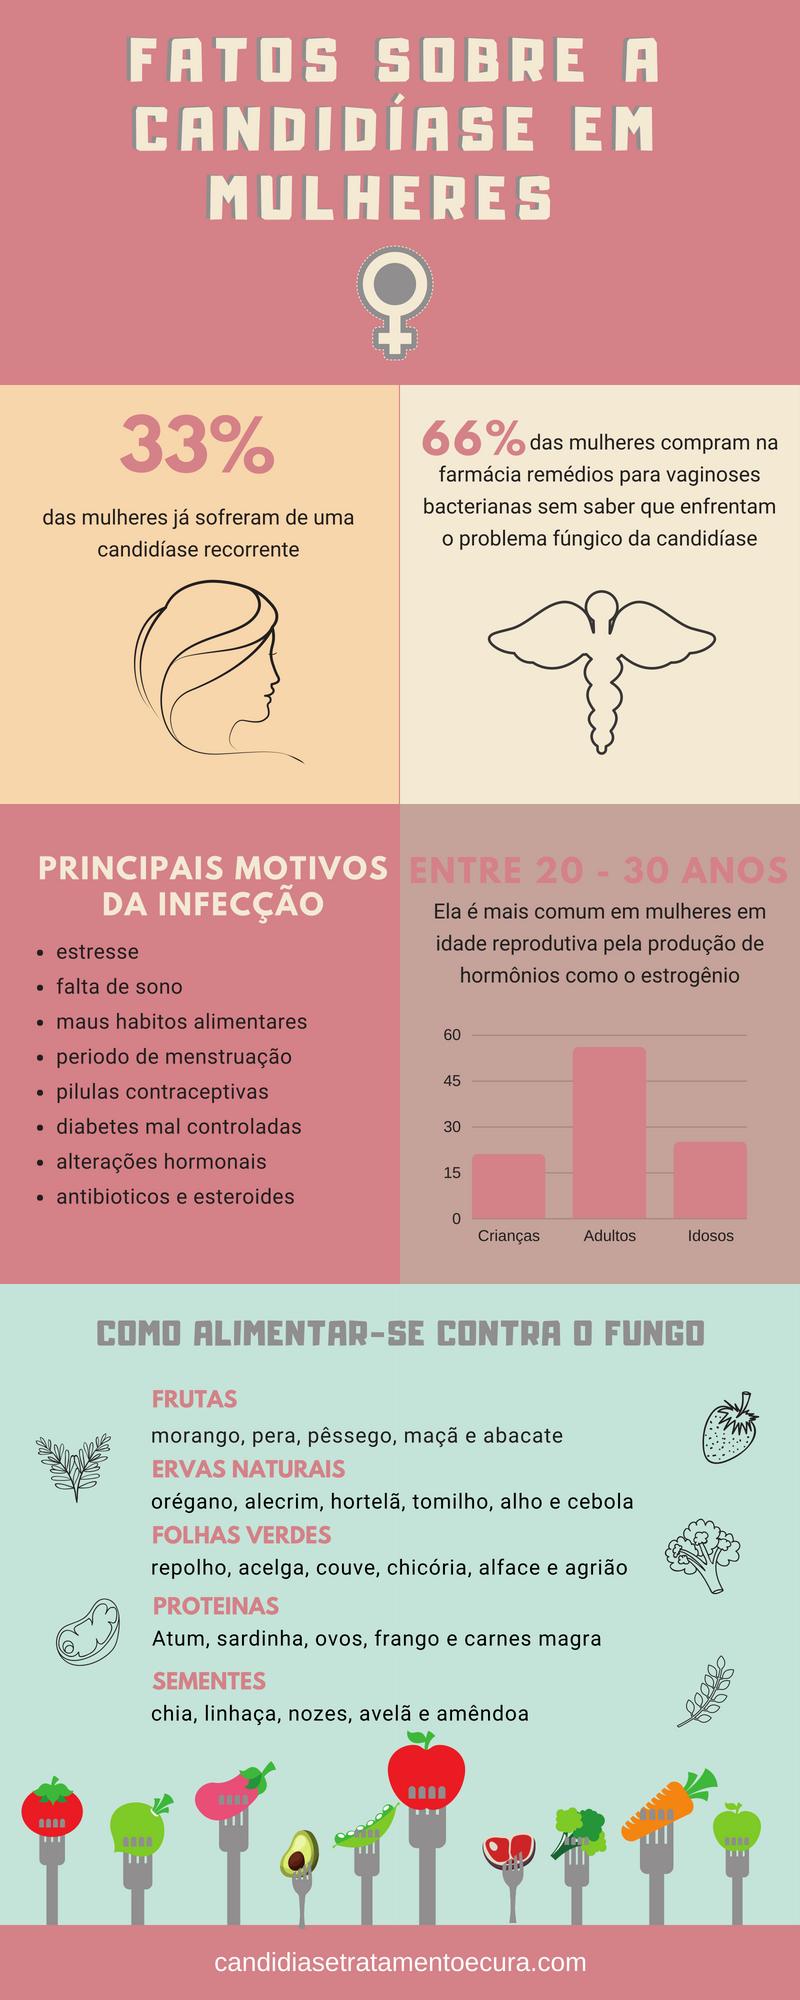 infográfico com dados sobre a candidíase feminina